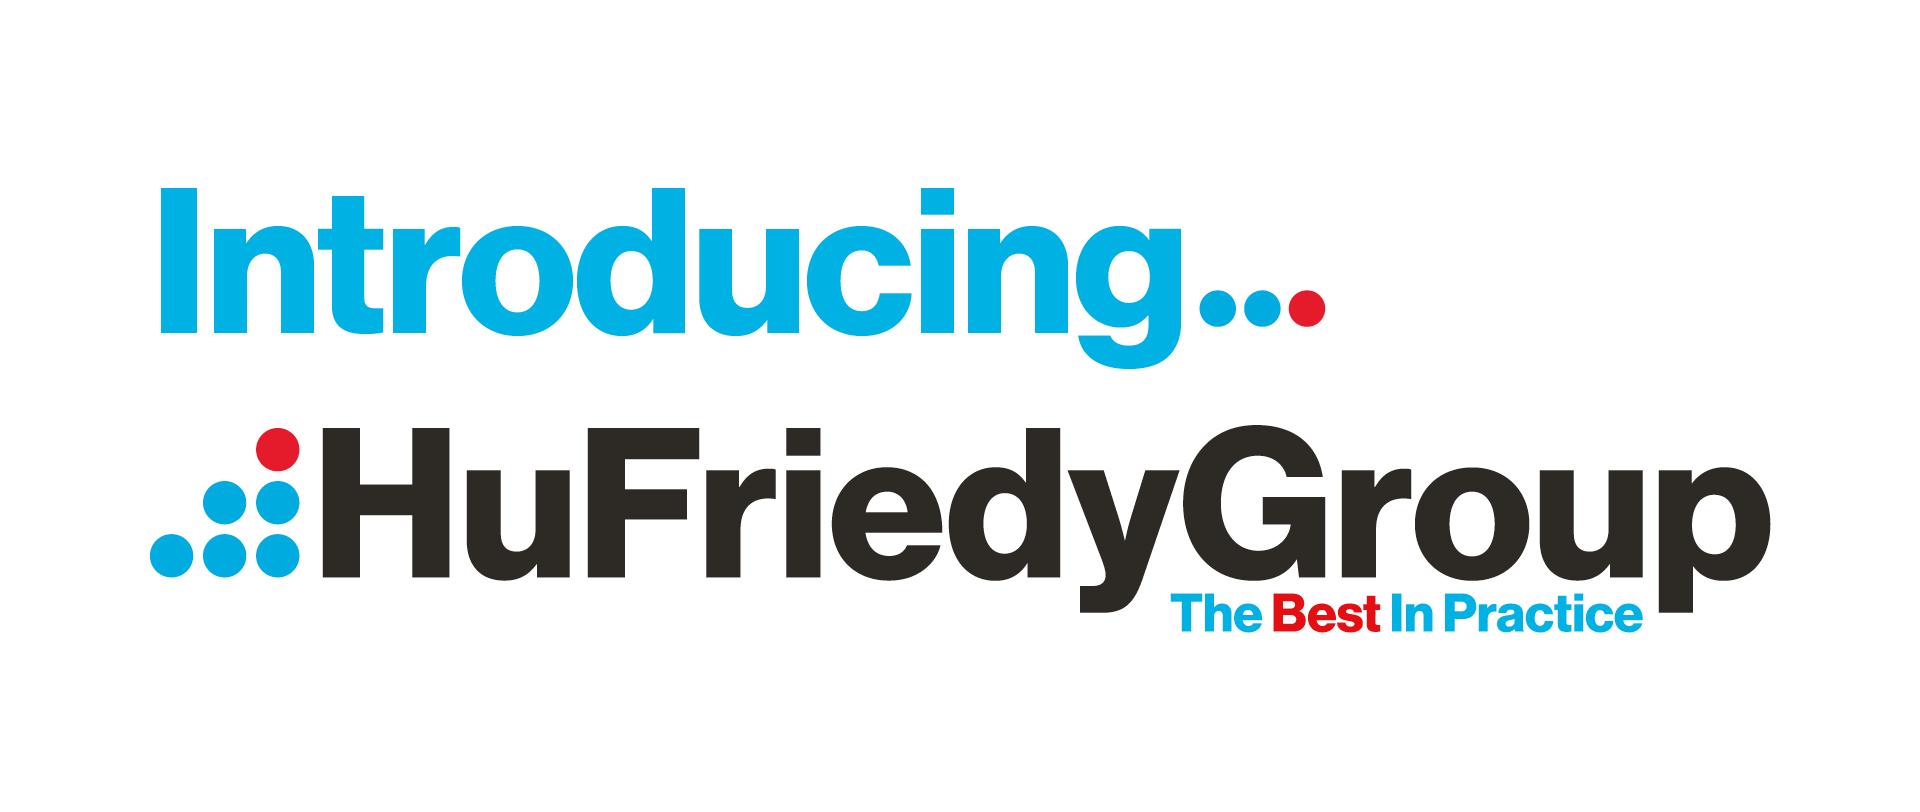 IntroducingHU-FriedyGroup